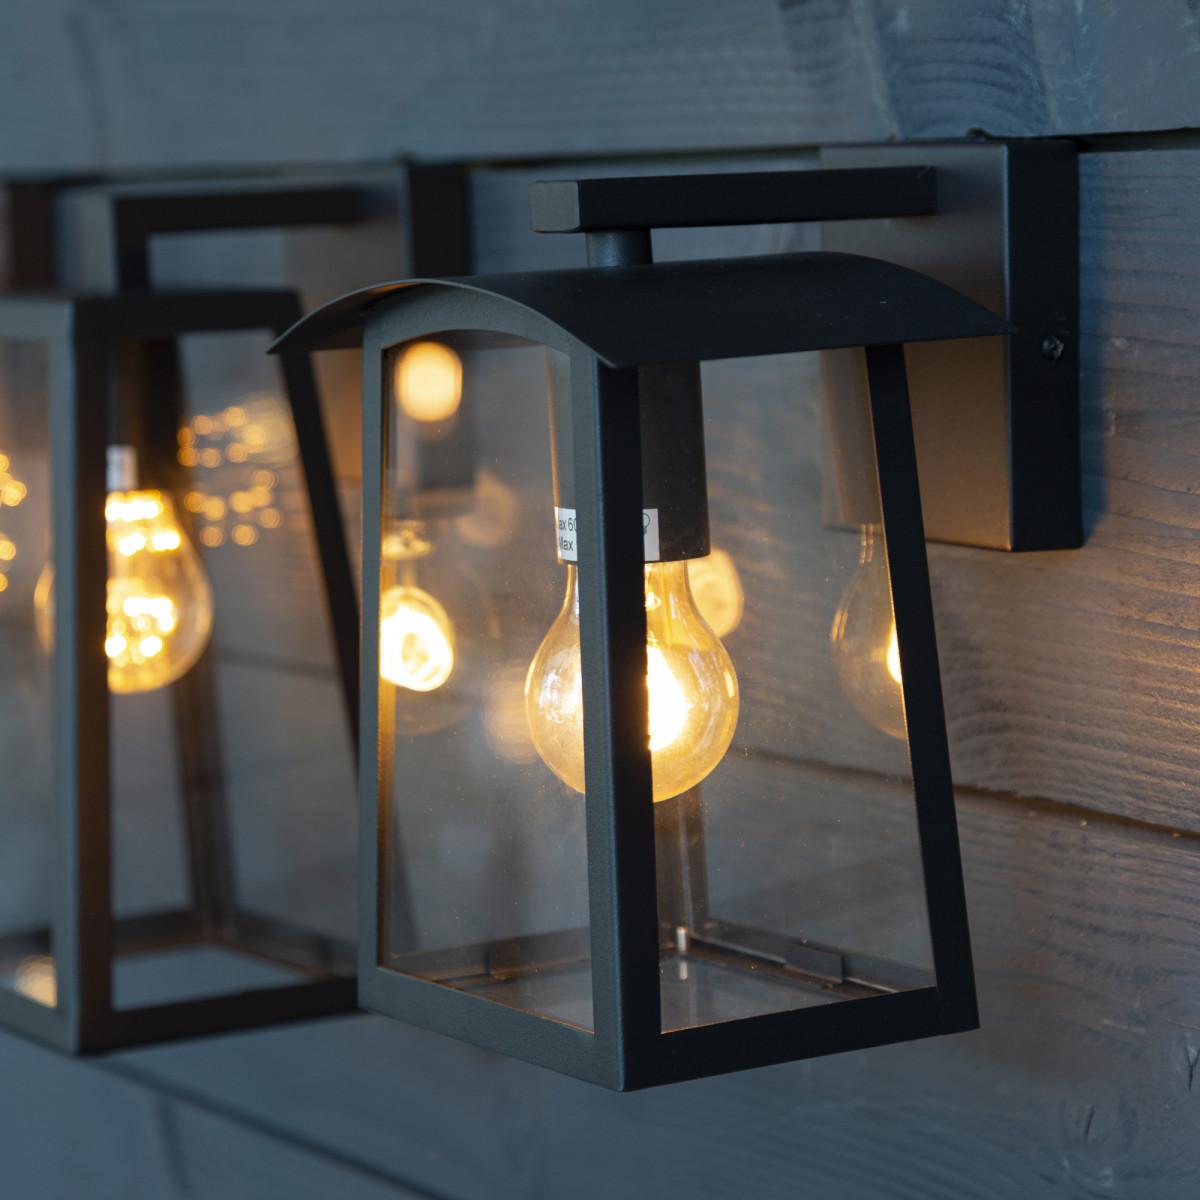 Design buitenlamp muur 7593